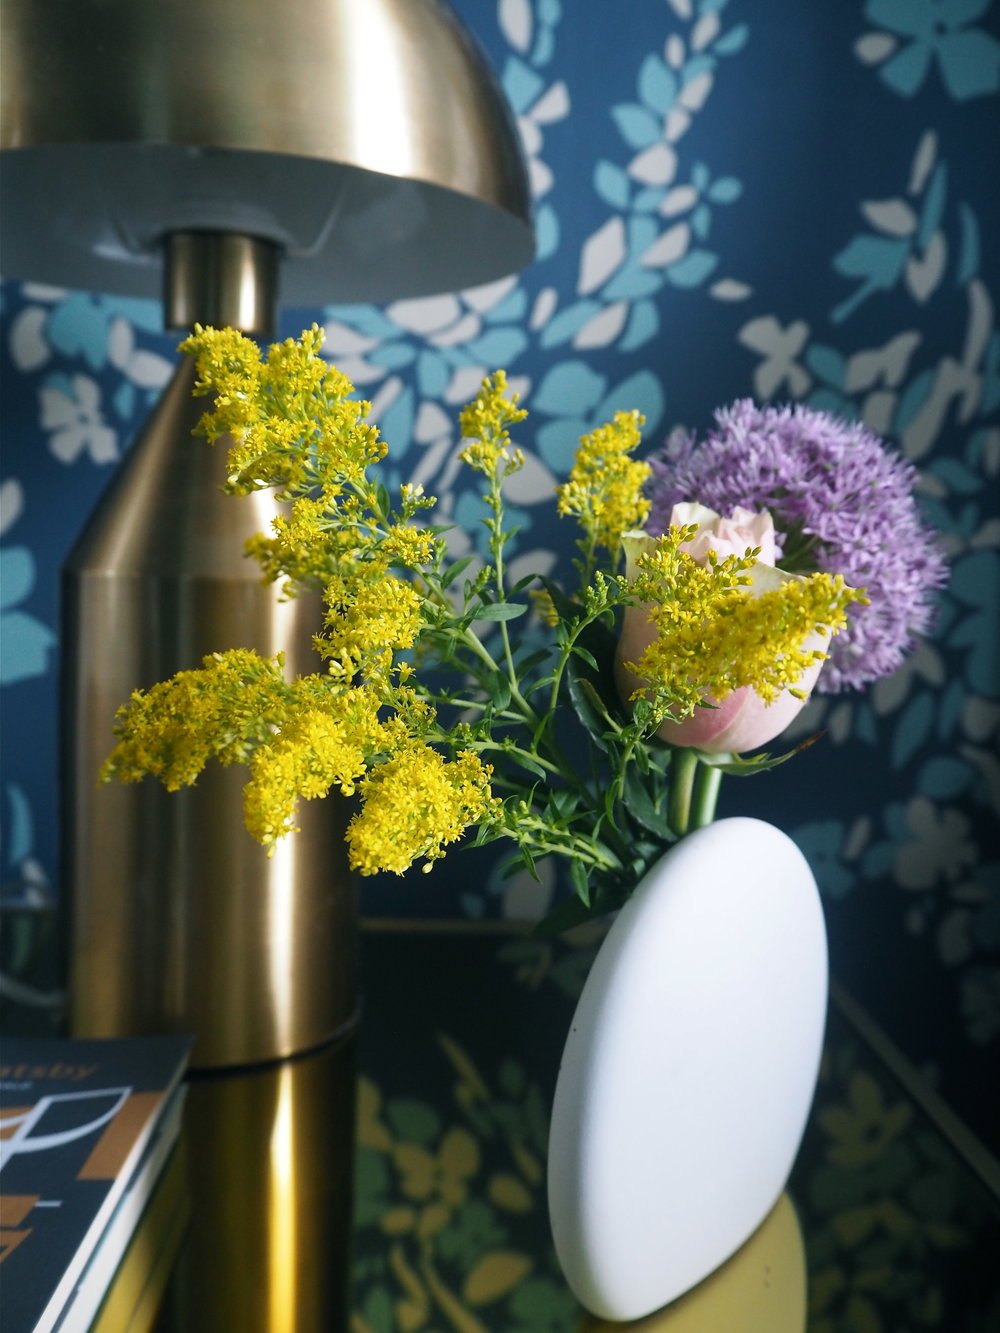 zens lifestyle rock blossom vase